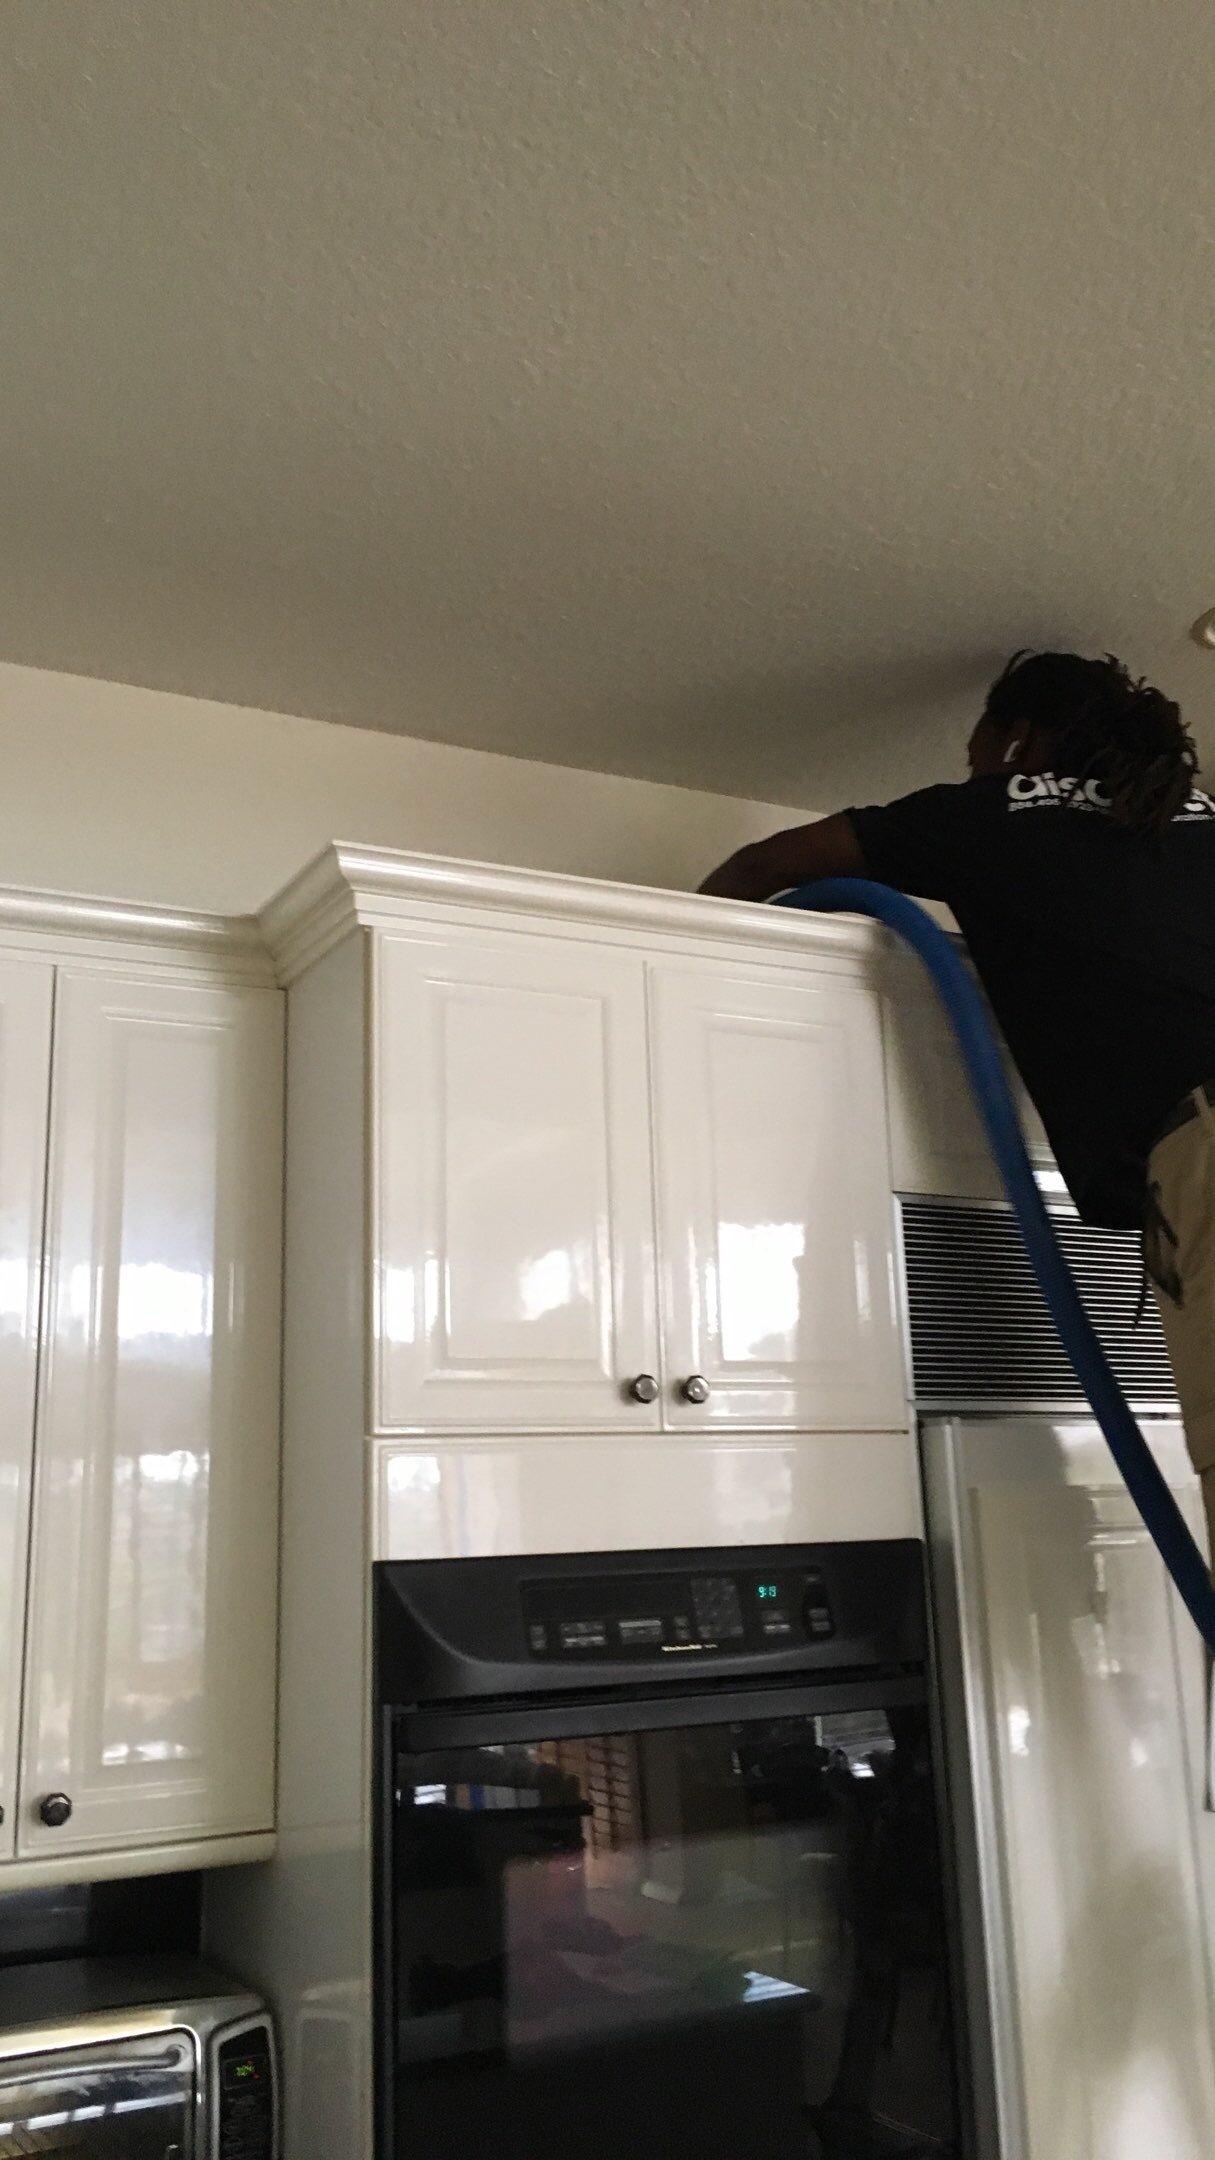 technician hepa-vacuuming kitchen cabinets